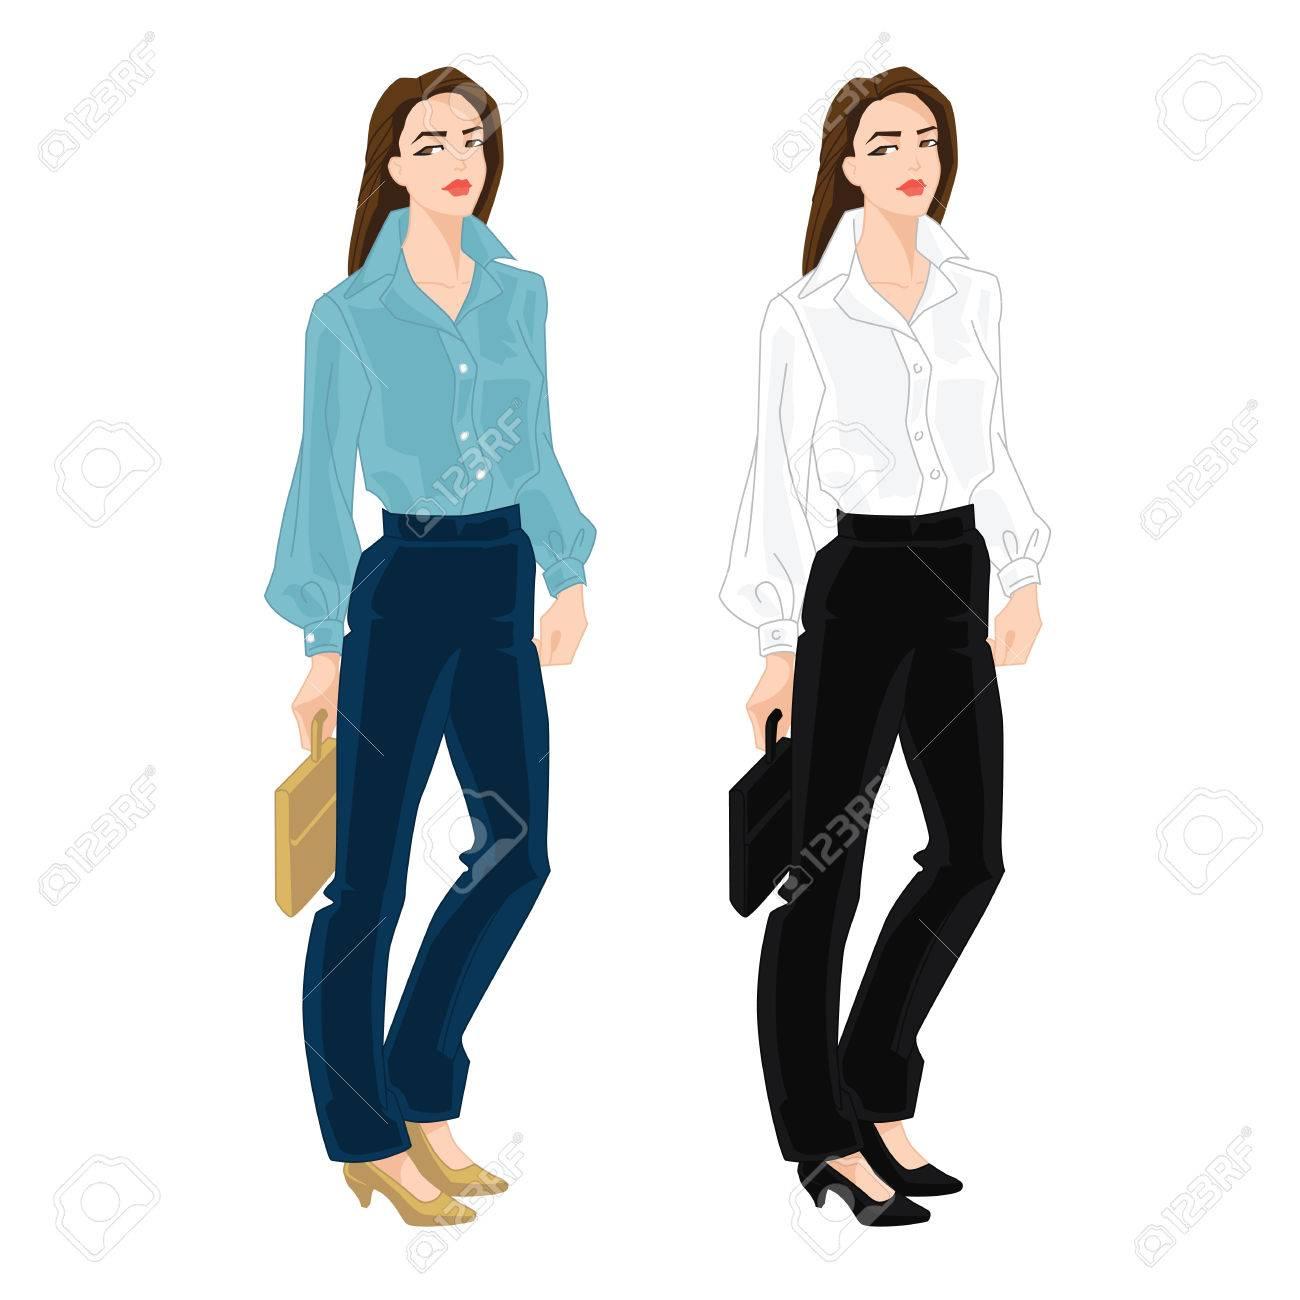 Vector Clipart - Business dress code. Vector Illustration gg97043760 -  GoGraph